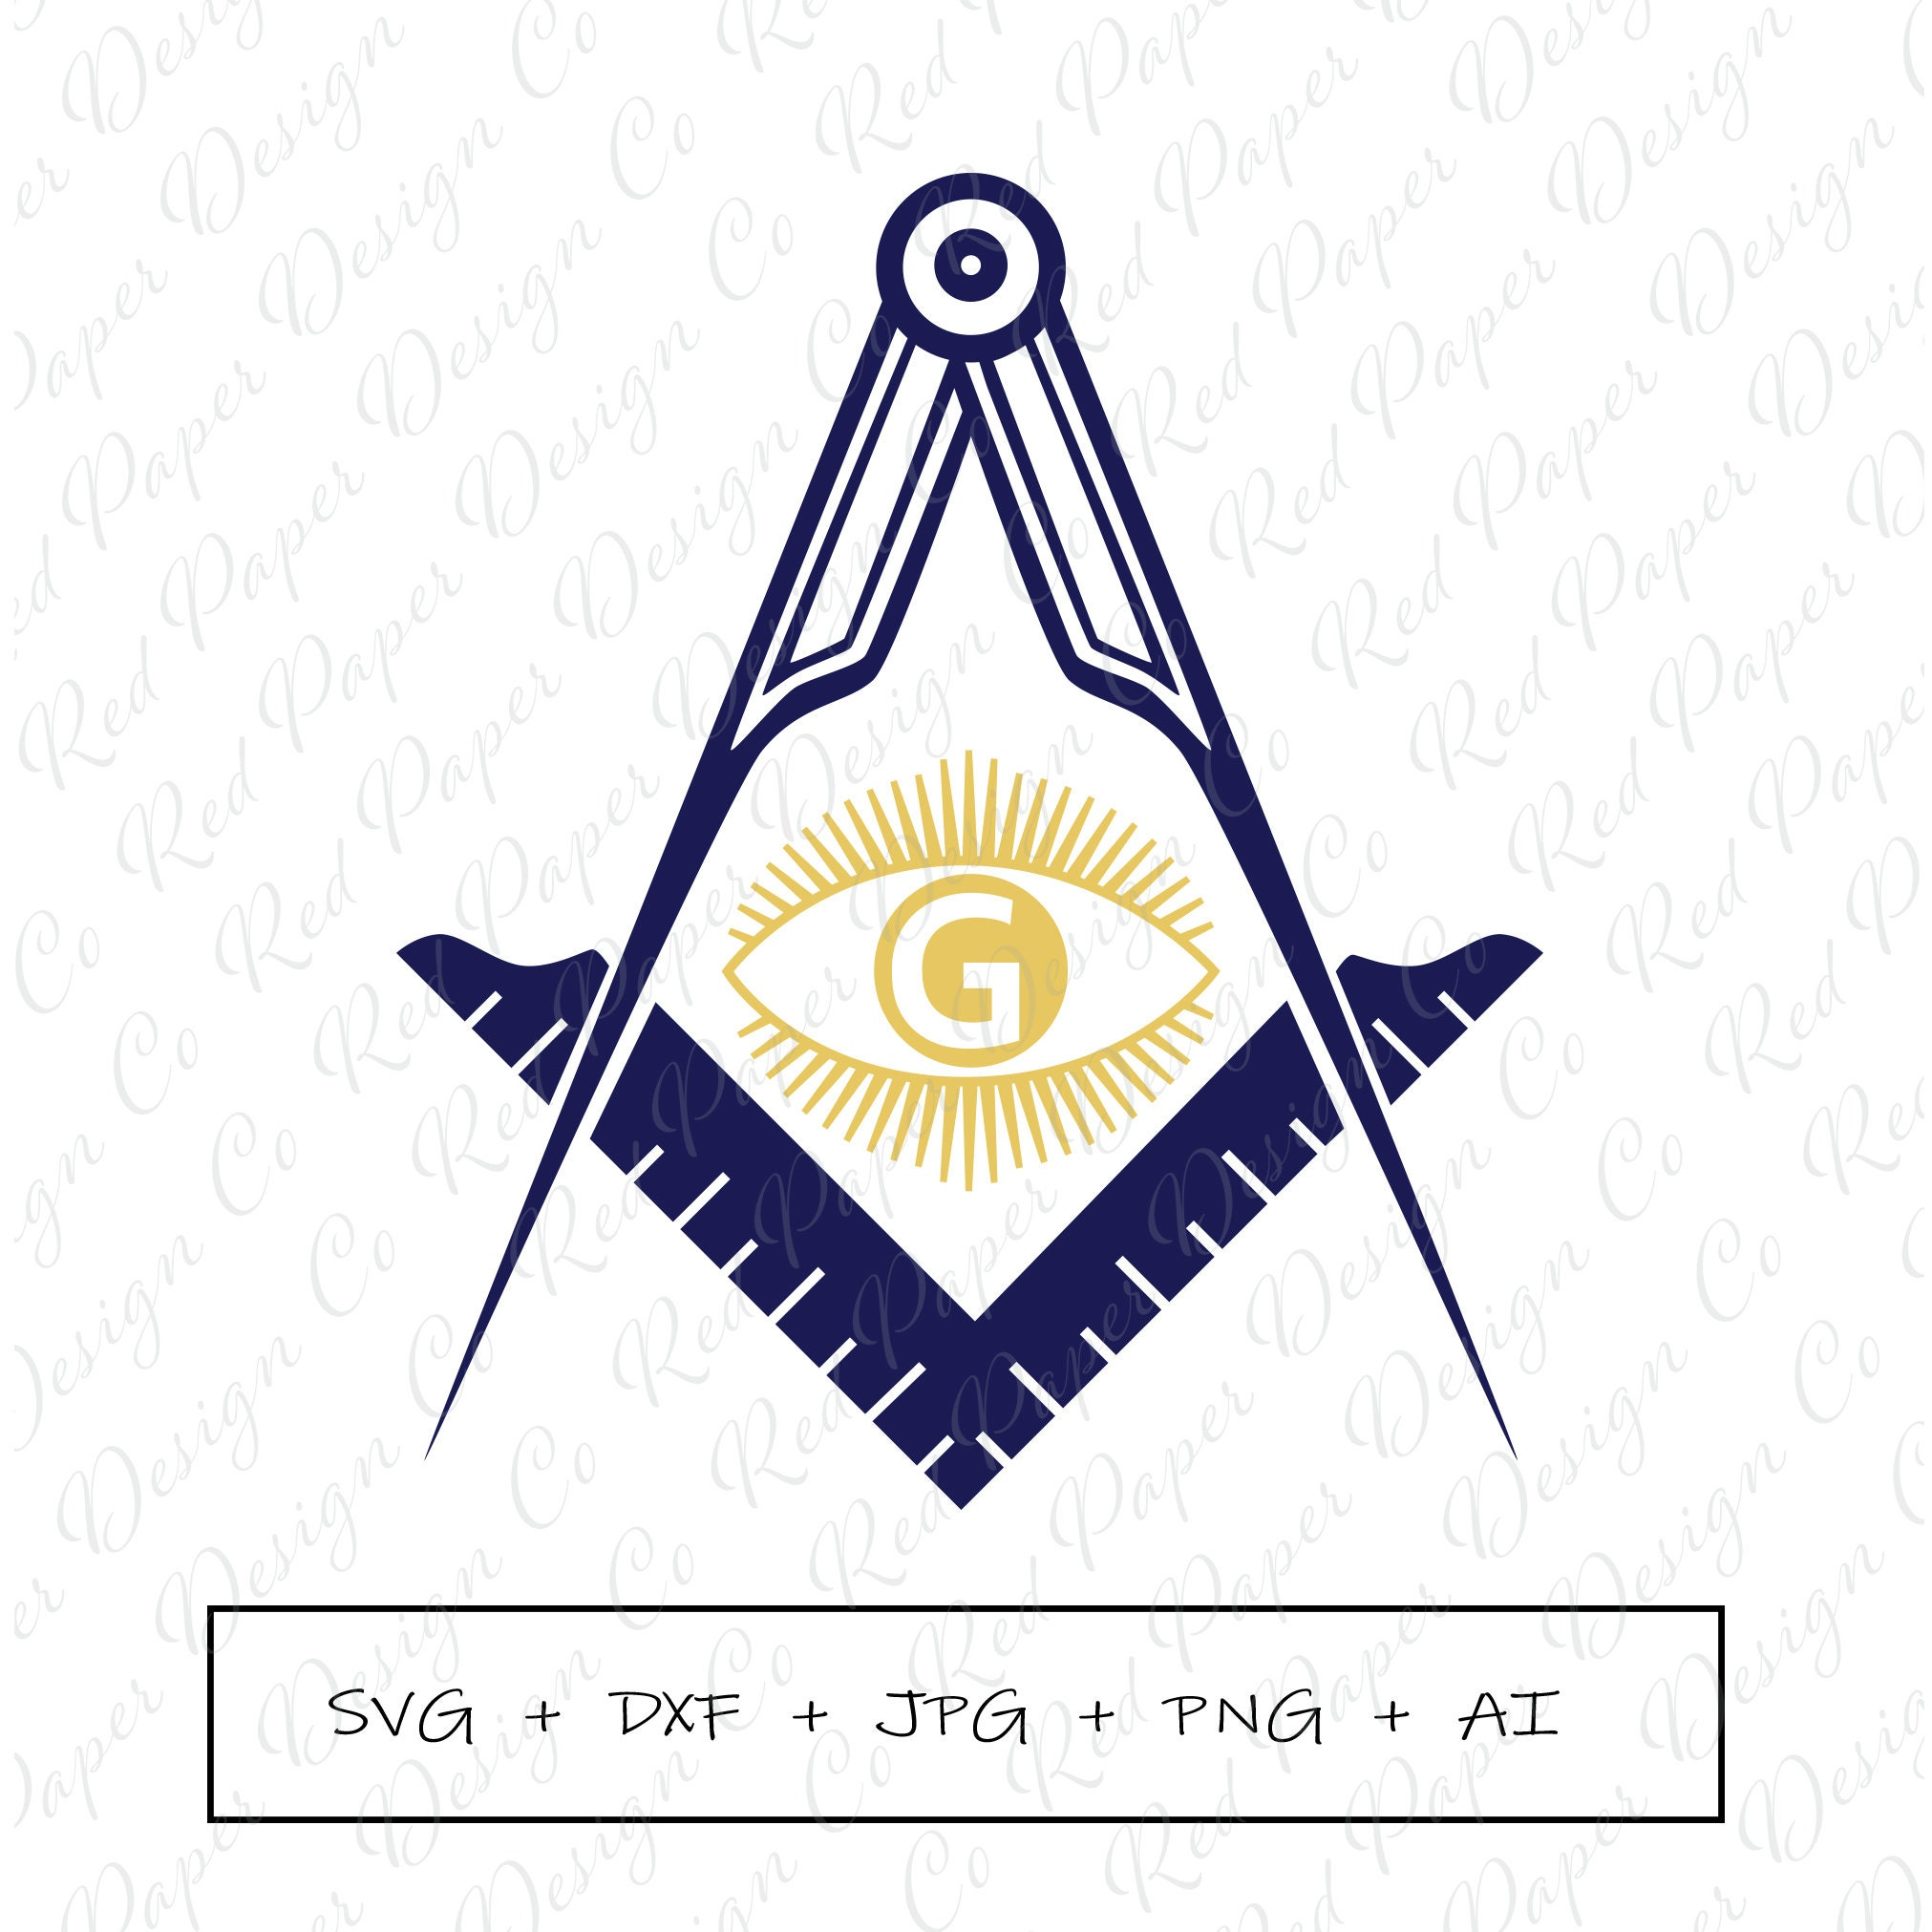 Lodge Freemasonry Eye Providence Mystic Eye Masonic Beanie Compass Square. Mason Illuminati Baroque Fraternity Freemason Masonry